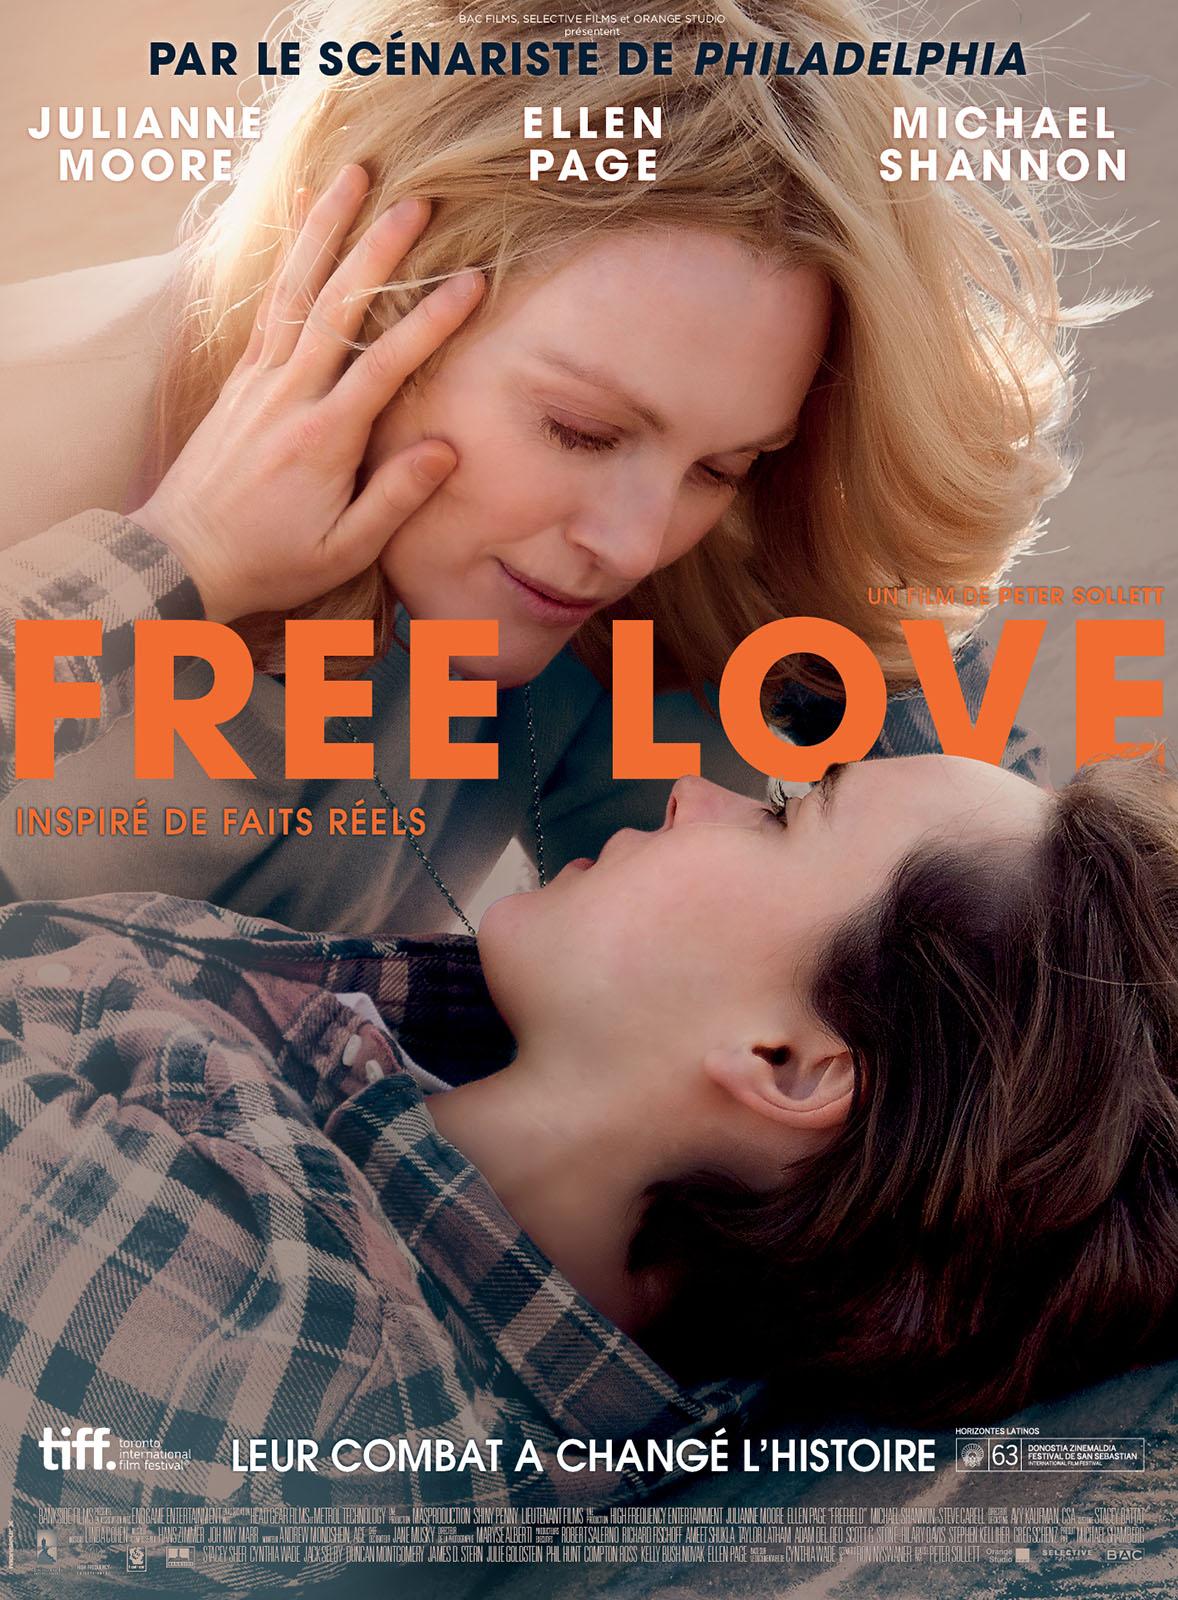 Free Love ddl